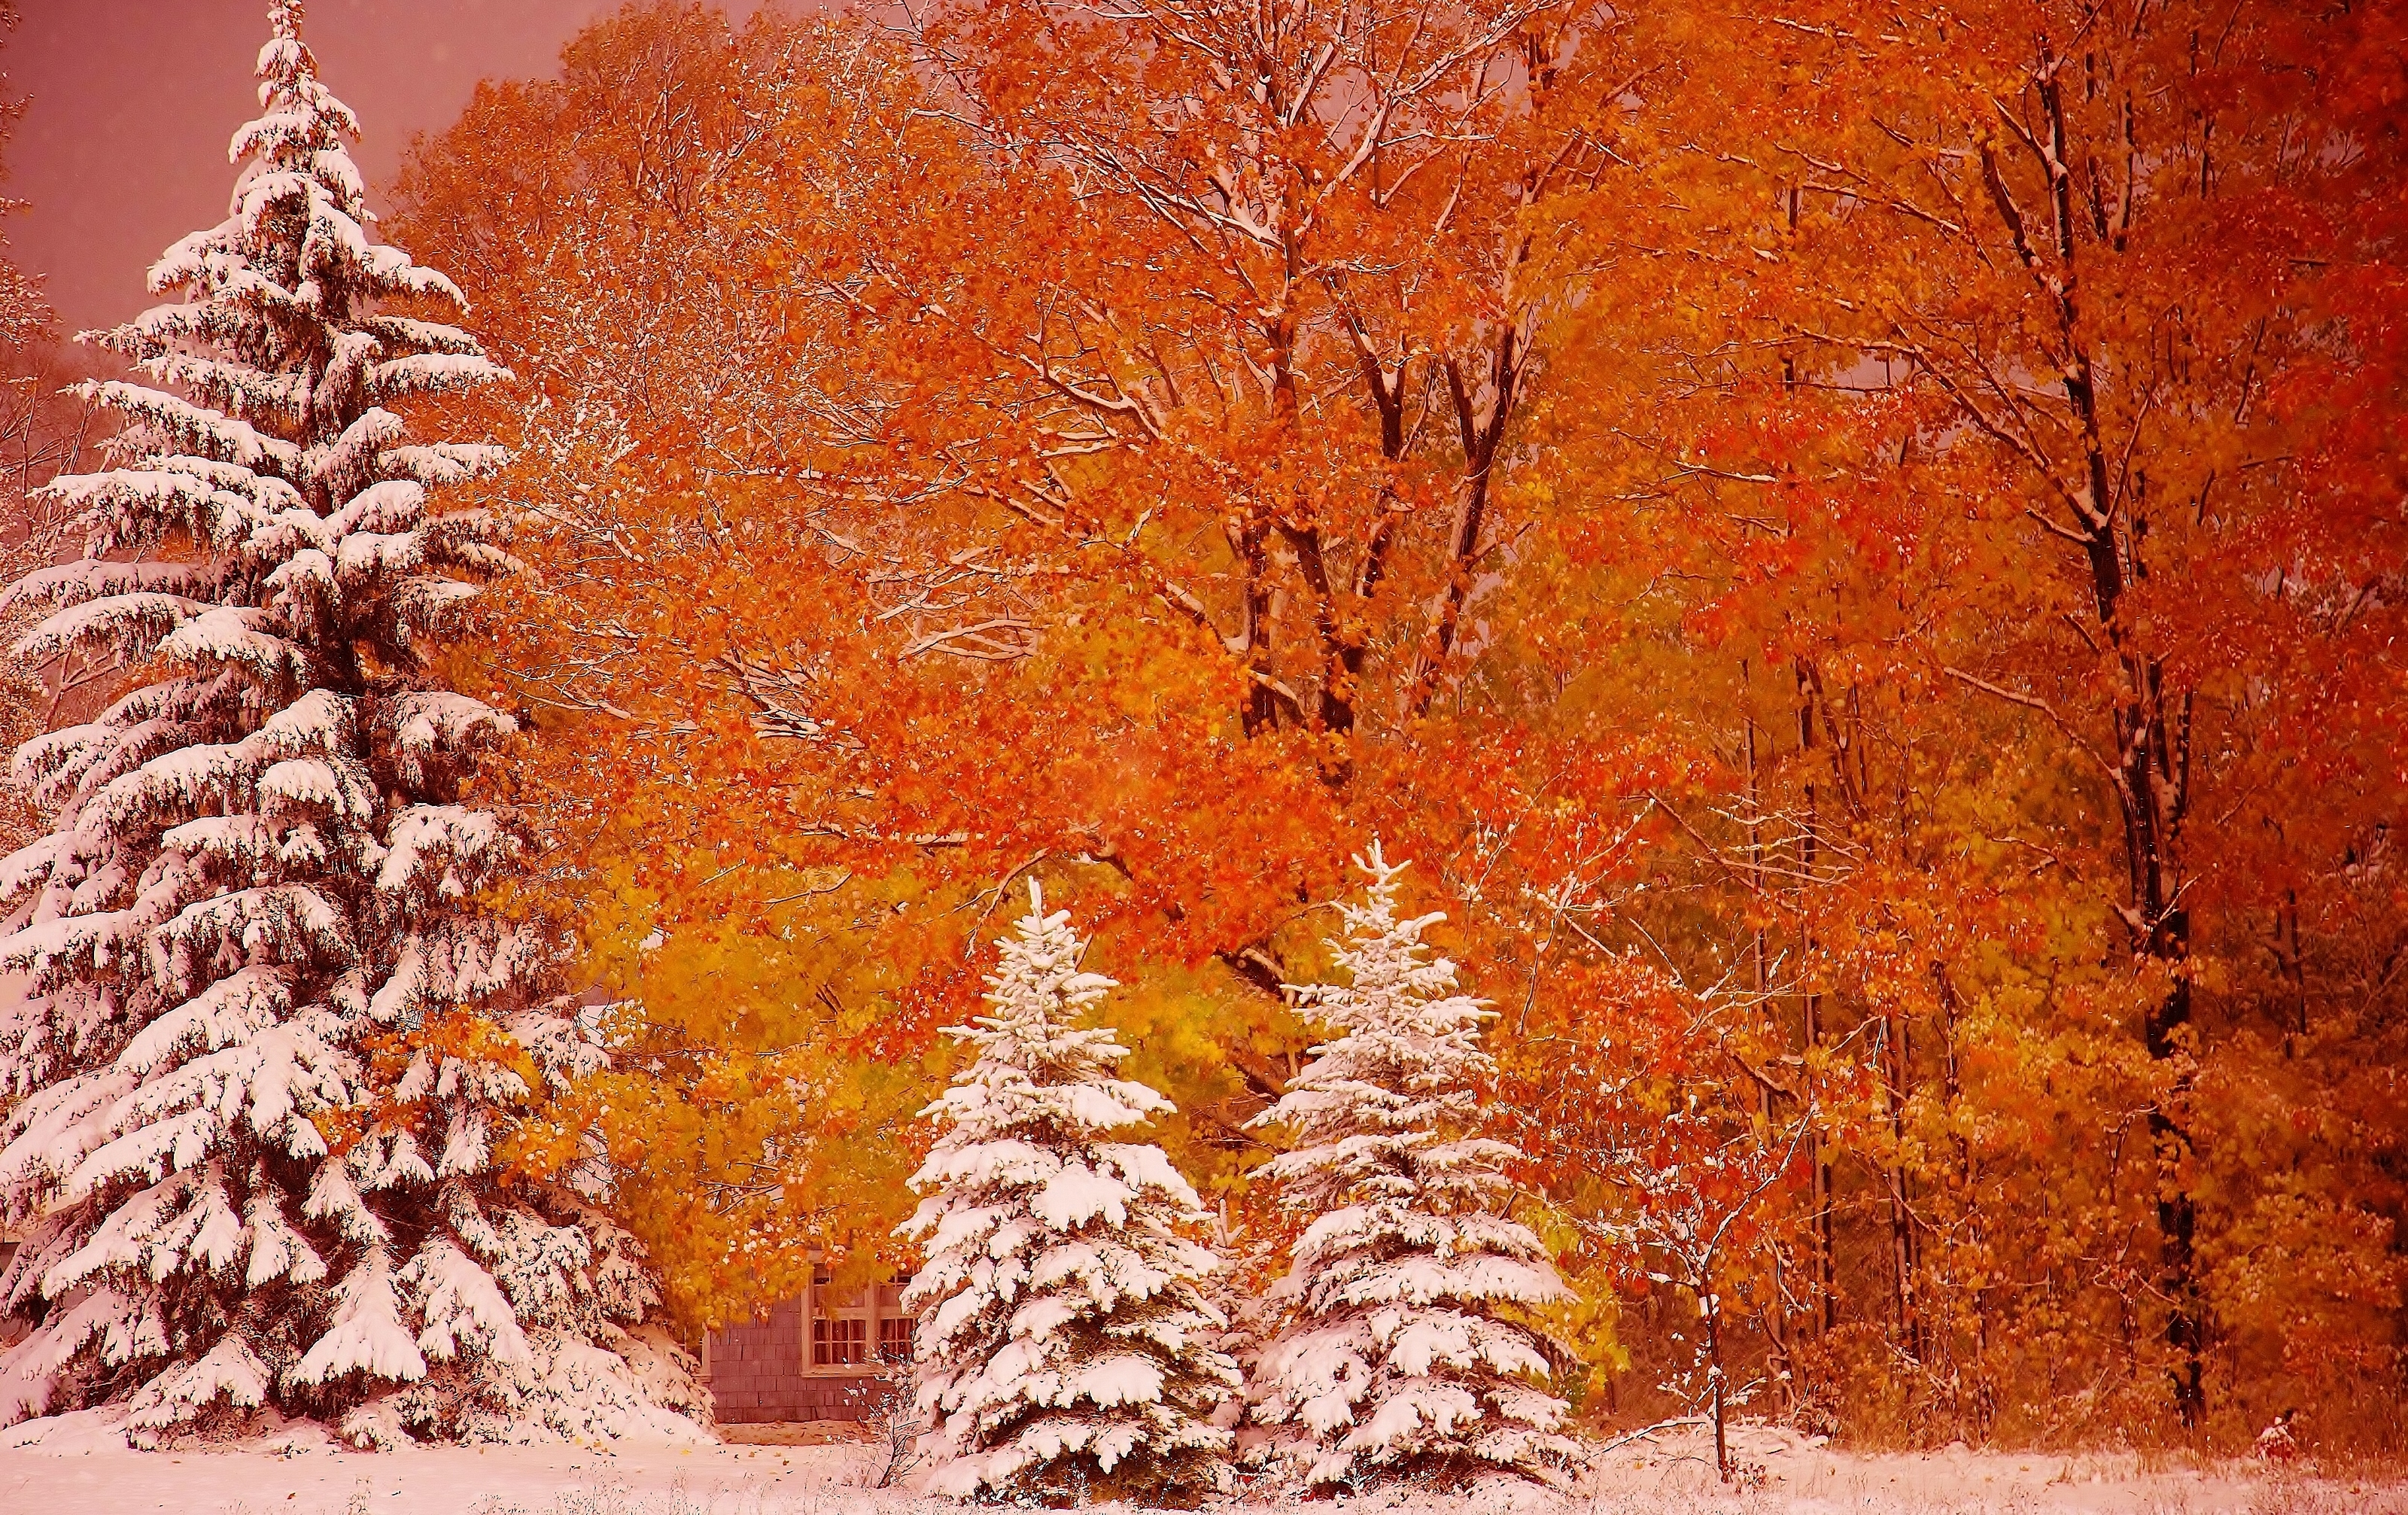 Фотообои ранняя зима на рабочий стол